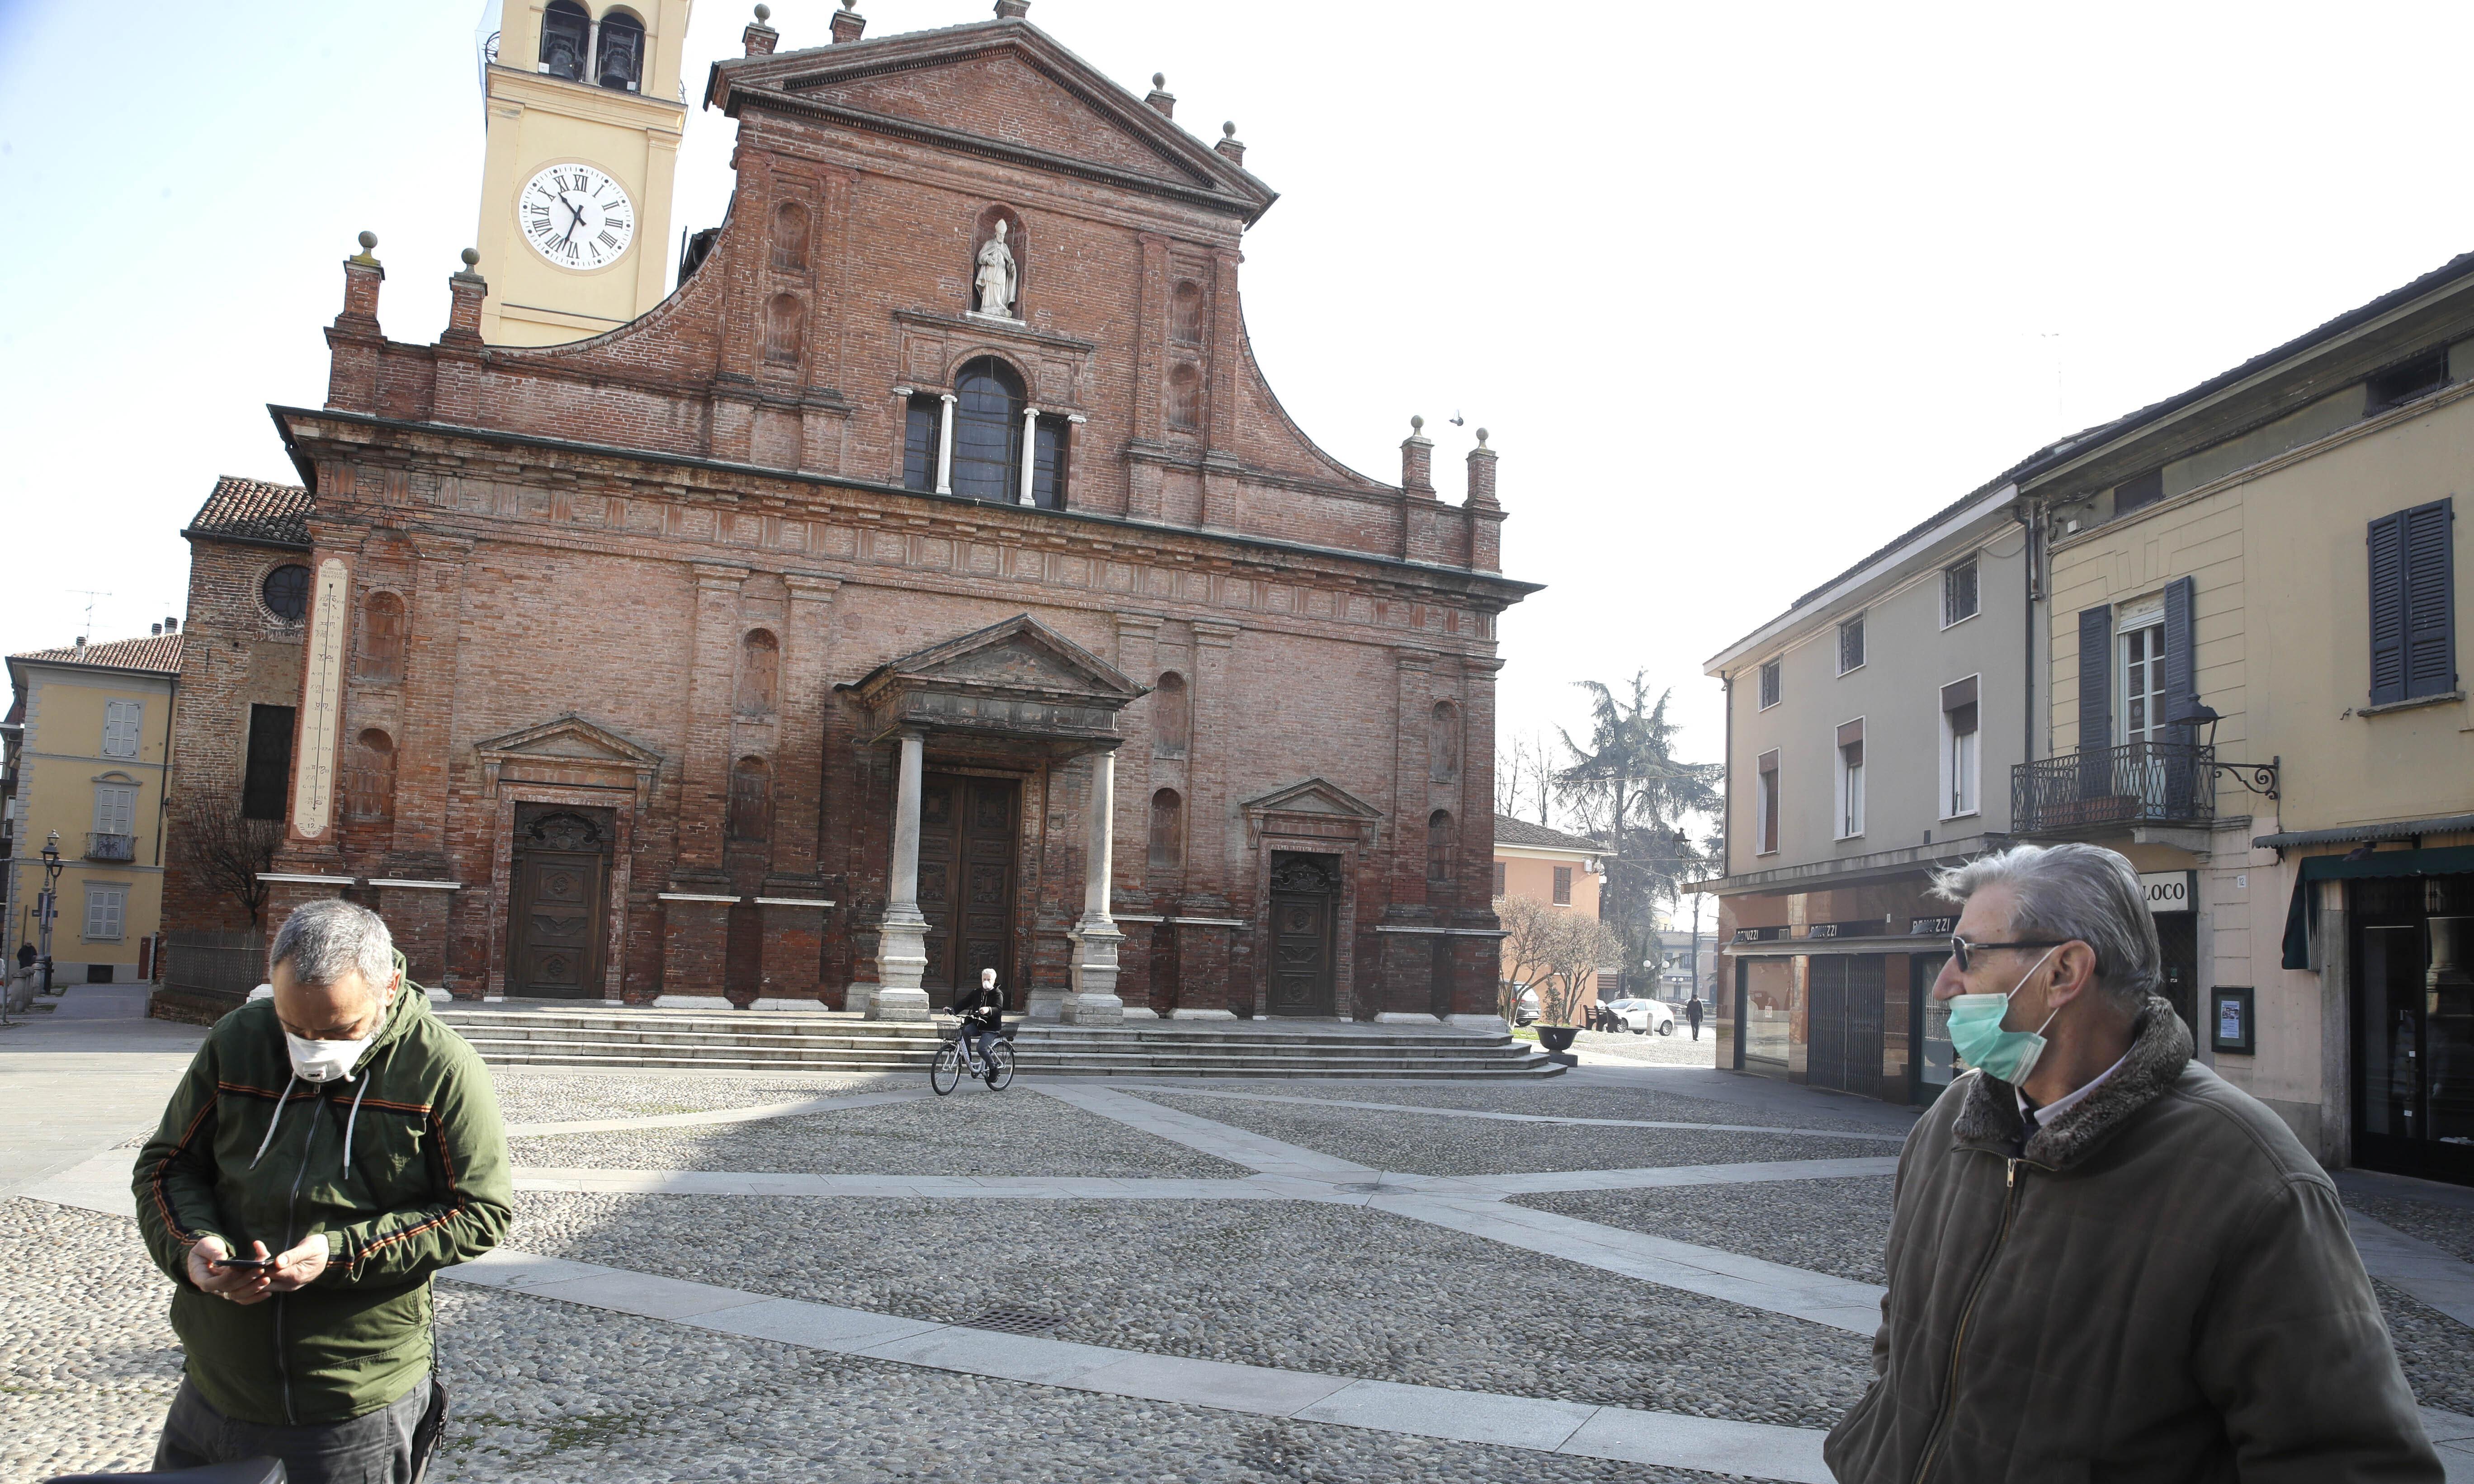 Coronavirus: northern Italian towns close schools and businesses